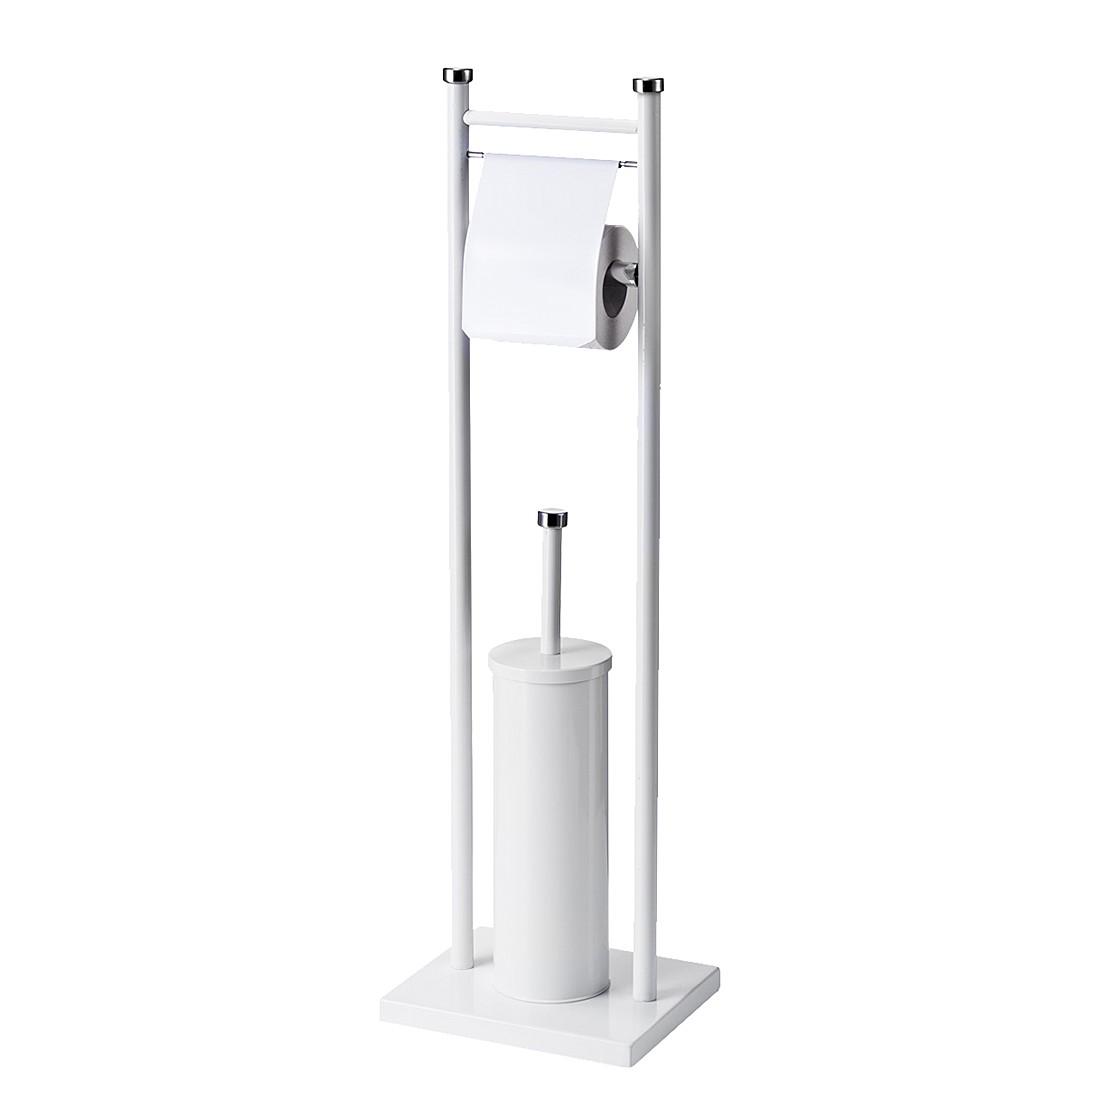 WC-Garnitur – Weiß, Metall, Zeller jetzt bestellen